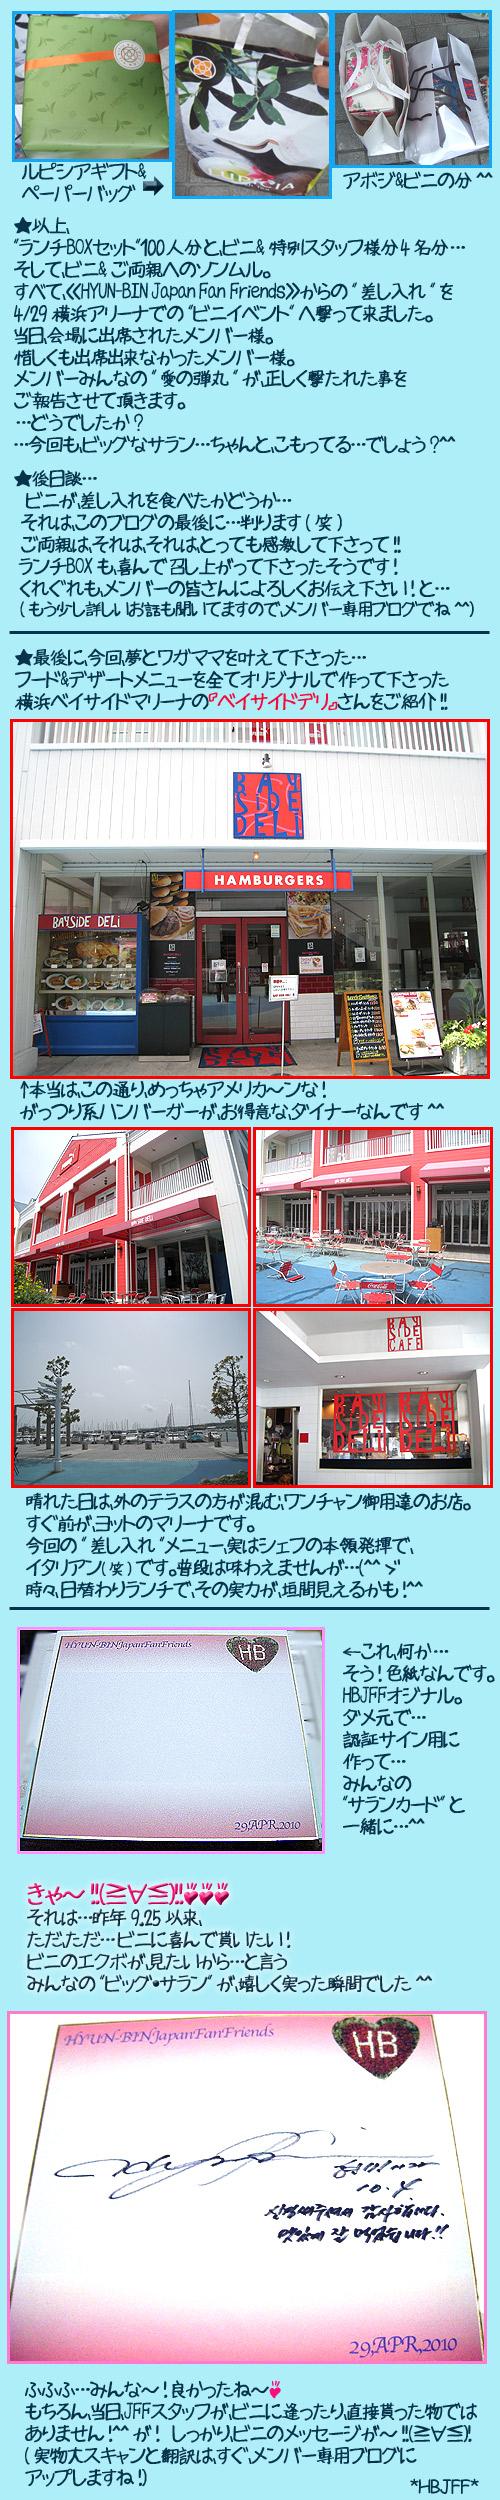 jff20100429_04a